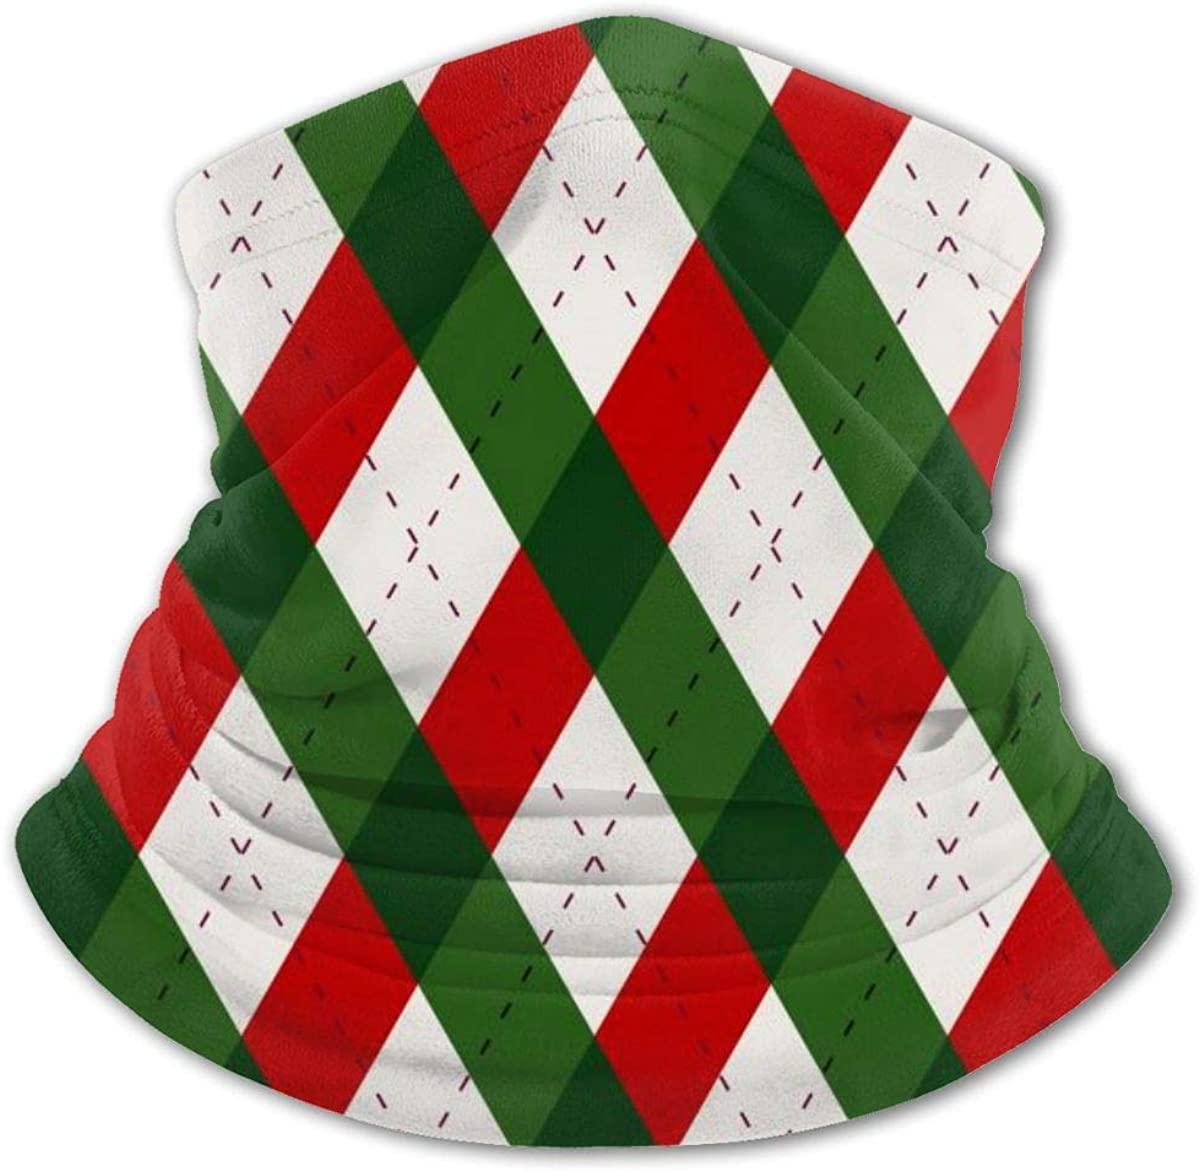 Christmas Headwear For Girls And Boys, Head Wrap, Neck Gaiter, Headband, Tenn Fishing Mask, Magic Scarf, Tube Mask, Face Bandana Mask For Camping Running Cycling